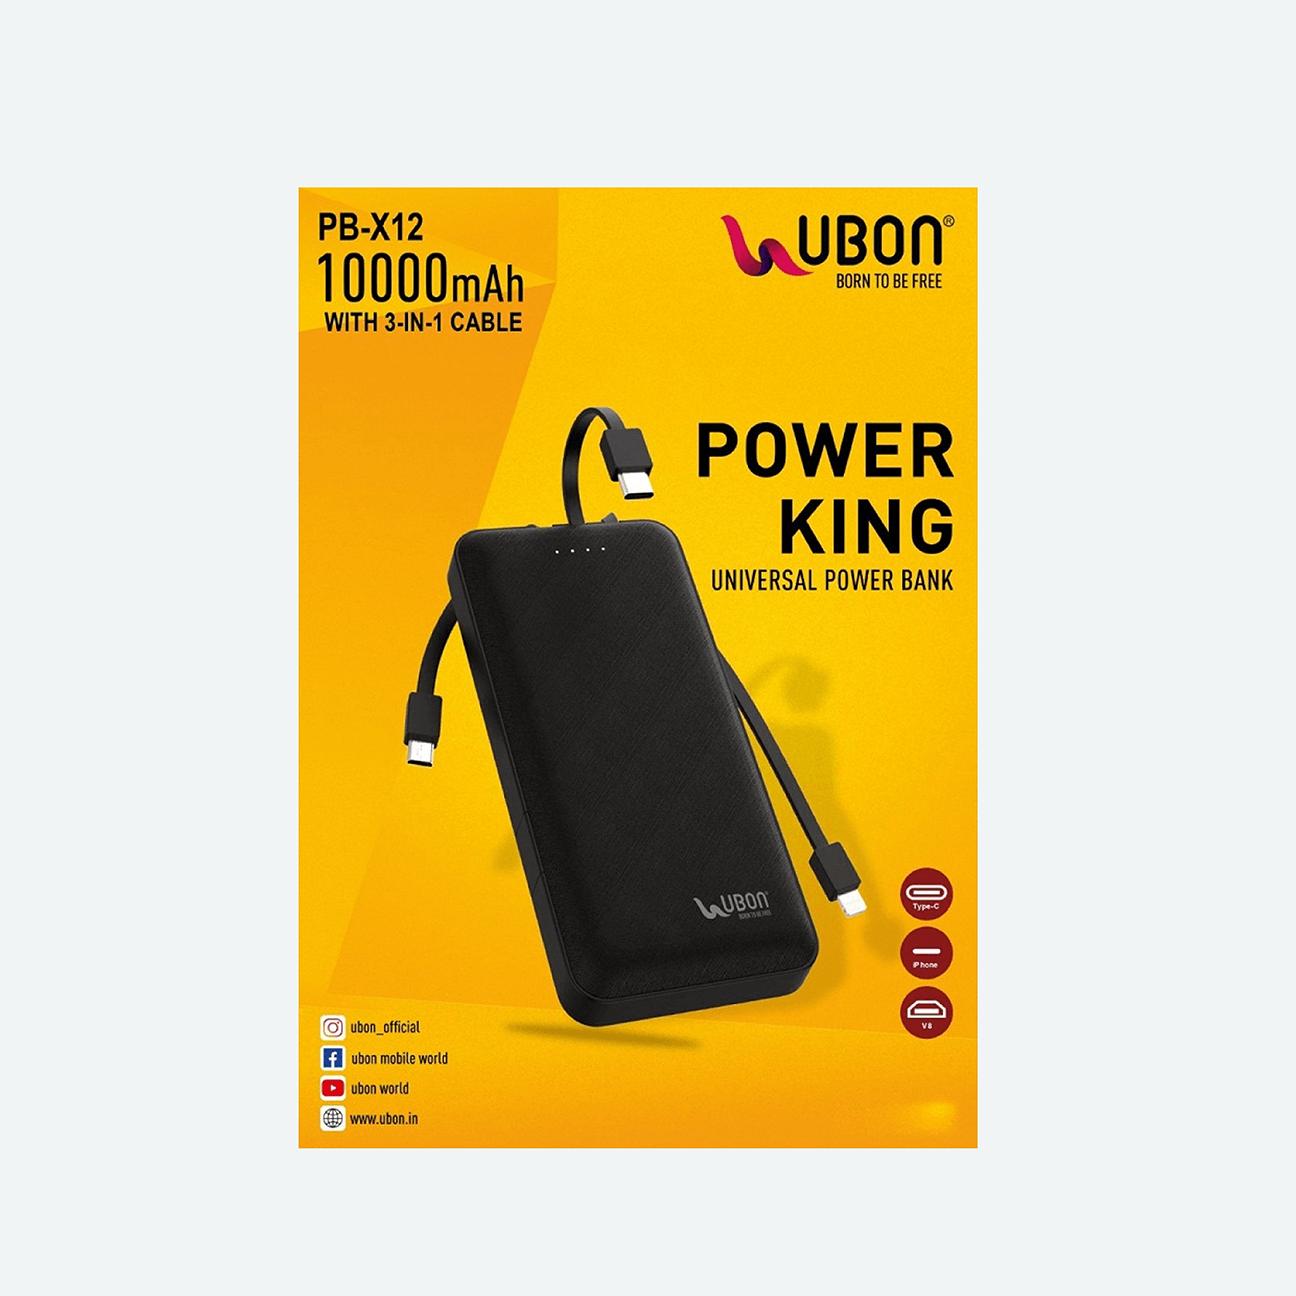 Ubon PB-X12 Massive 10000mAh Power Bank